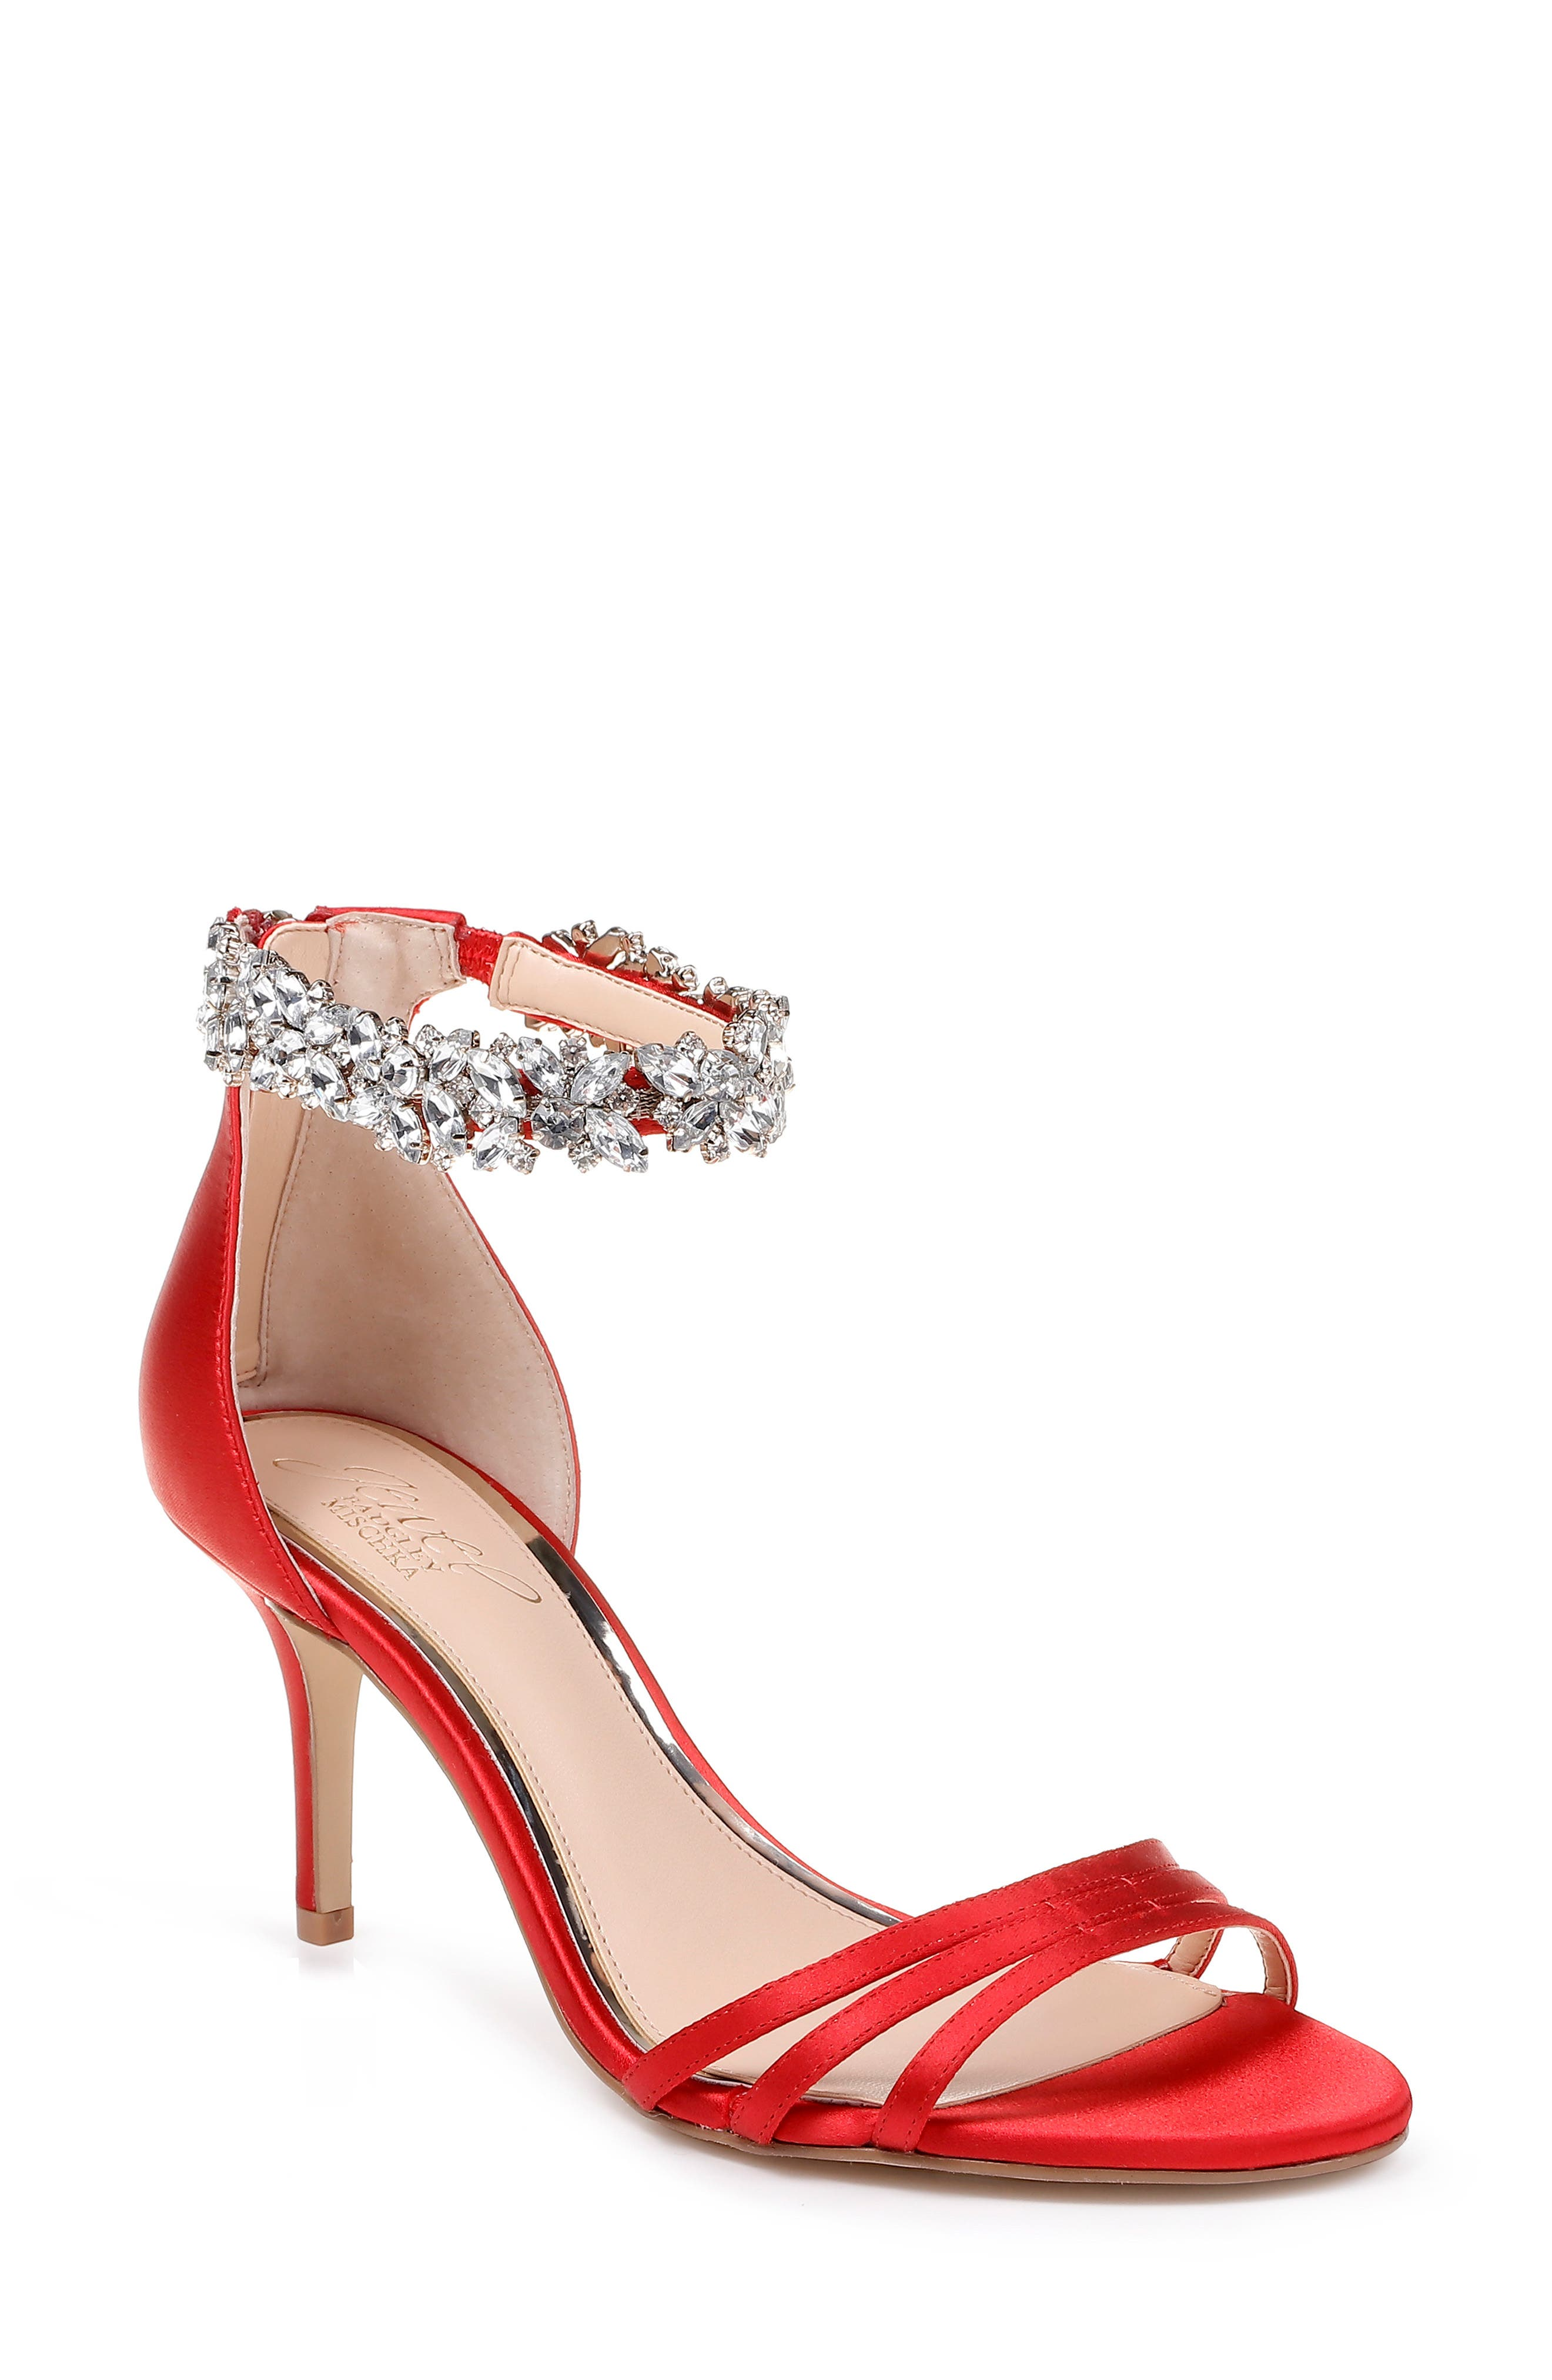 Jewel Badgley Mischka Zamora Ankle Strap Sandal- Red